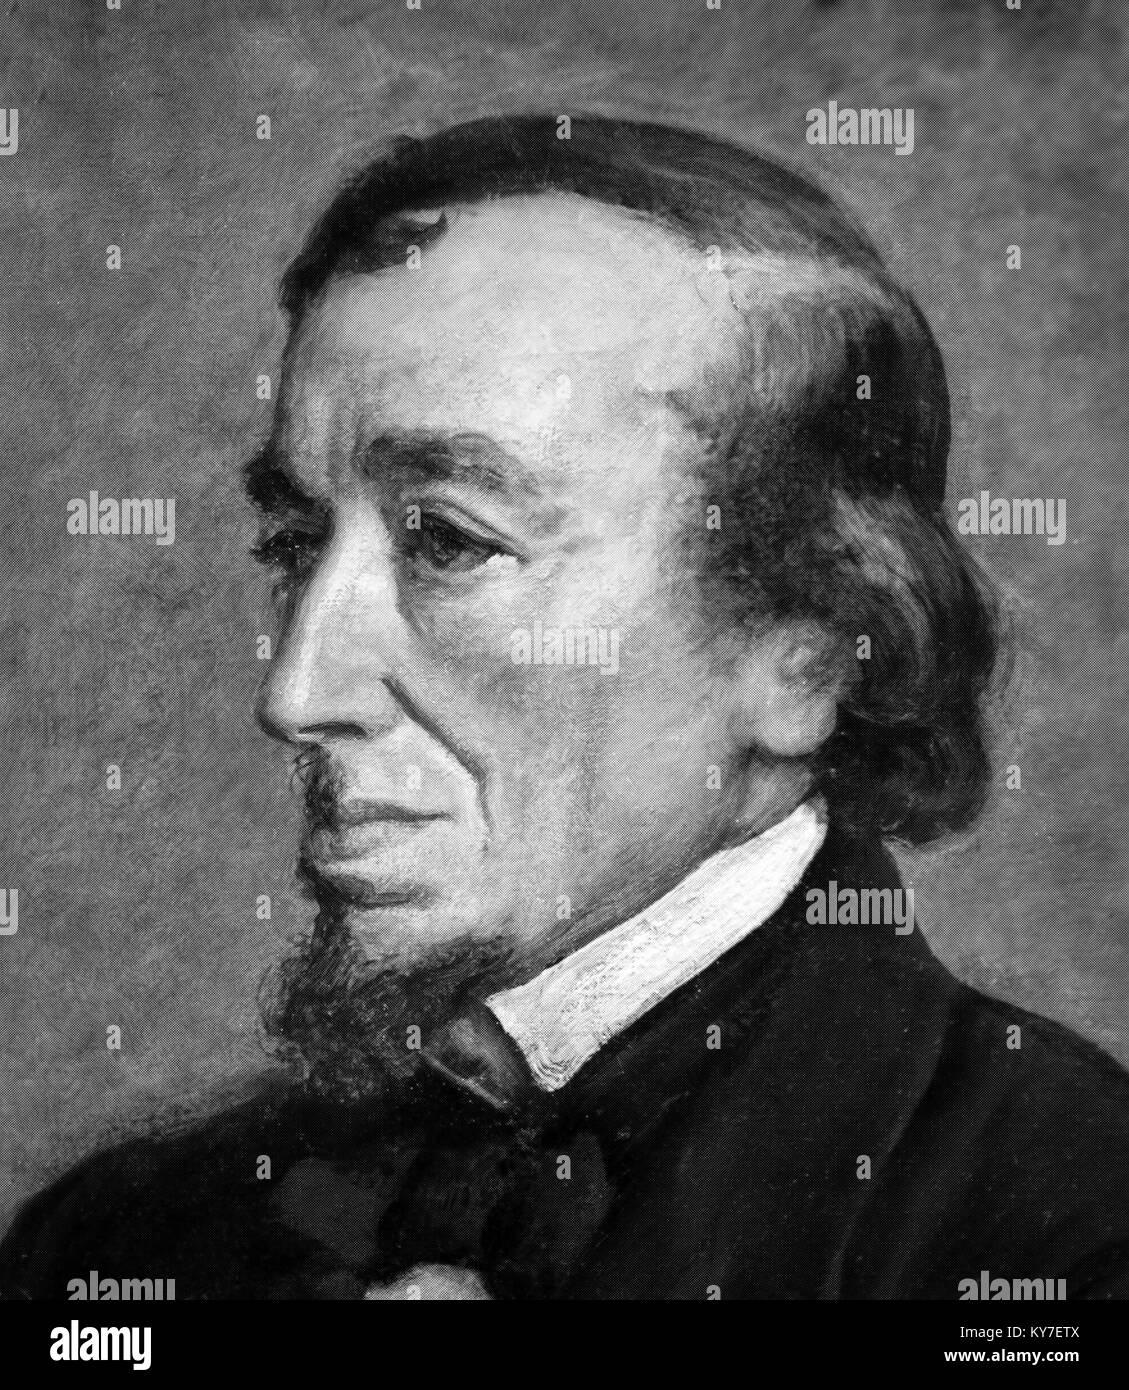 Disraeli. Portrait of Benjamin Disraeli, 1st Earl of Beaconsfield (1804-1881) - Stock Image